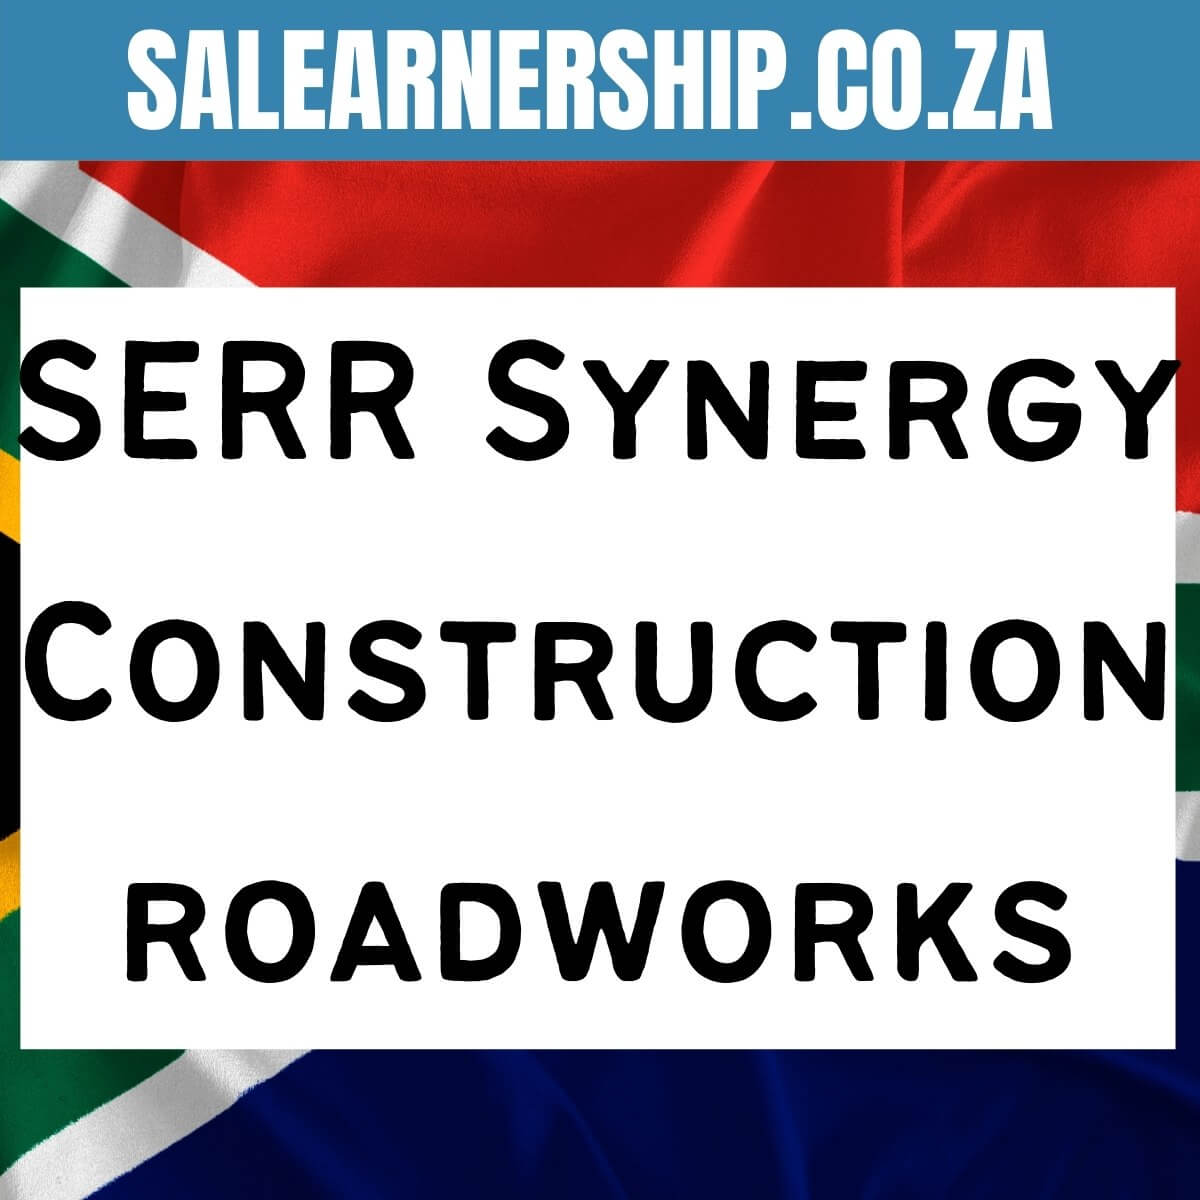 serr synergy construction roadworks